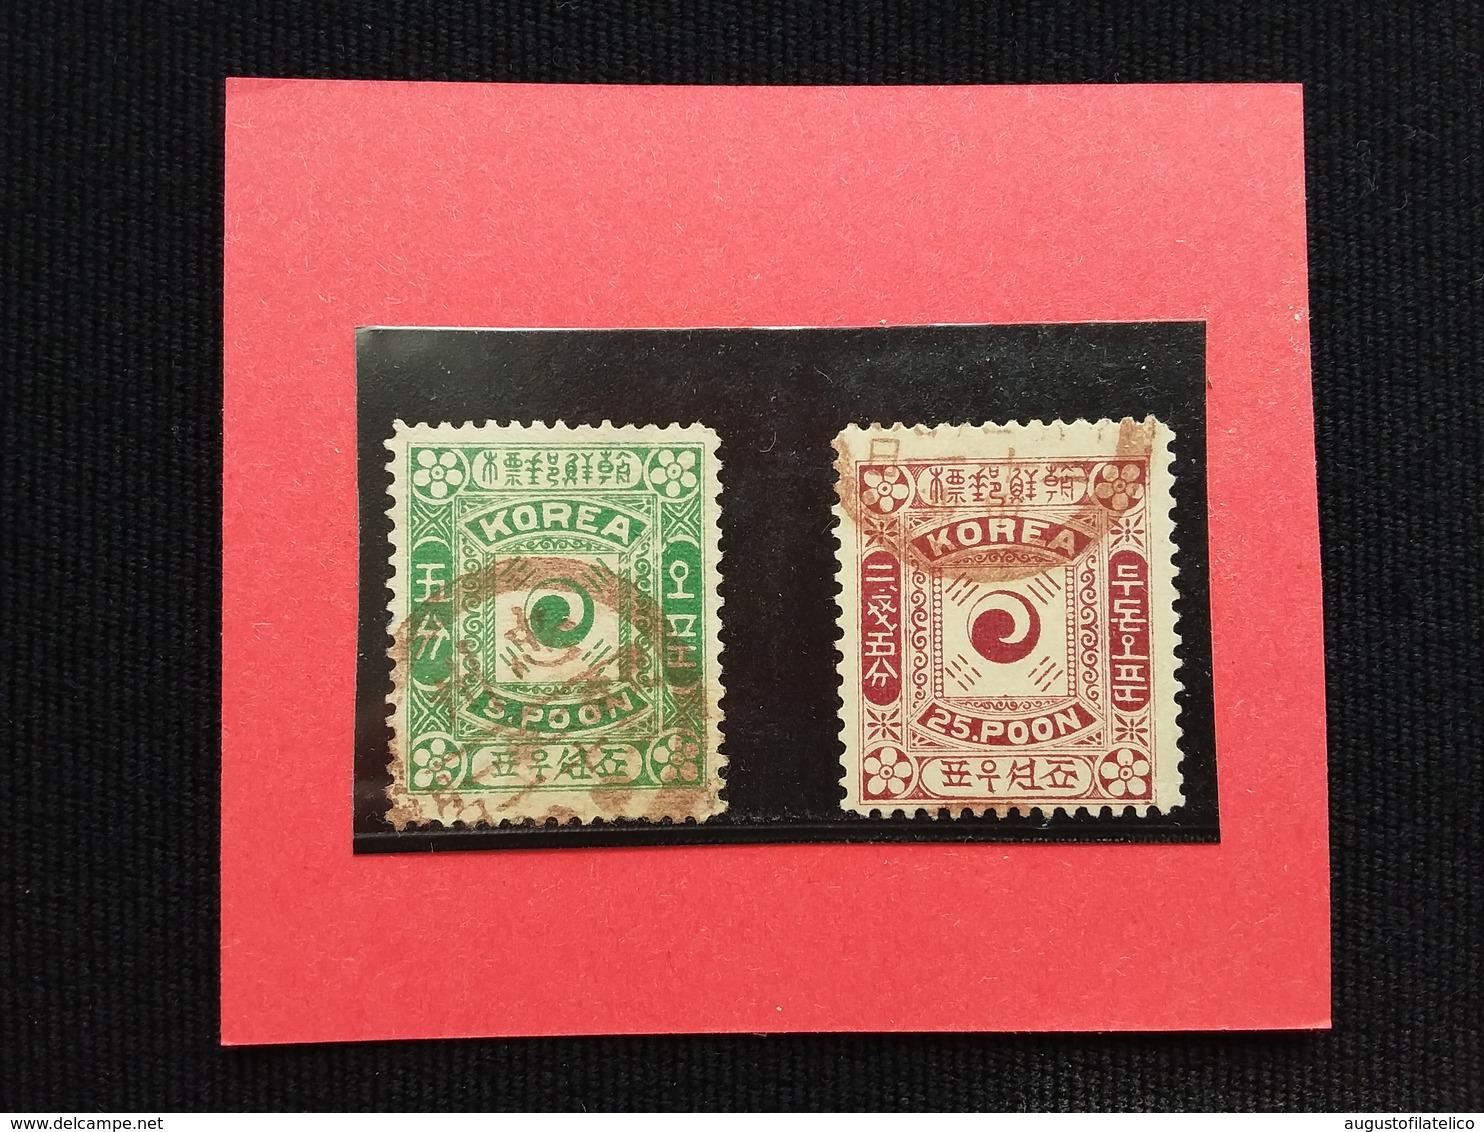 COREA 1895/99 - Nn. 6A-8 Yvert Timbrati + Spese Postali - Corea (...-1945)